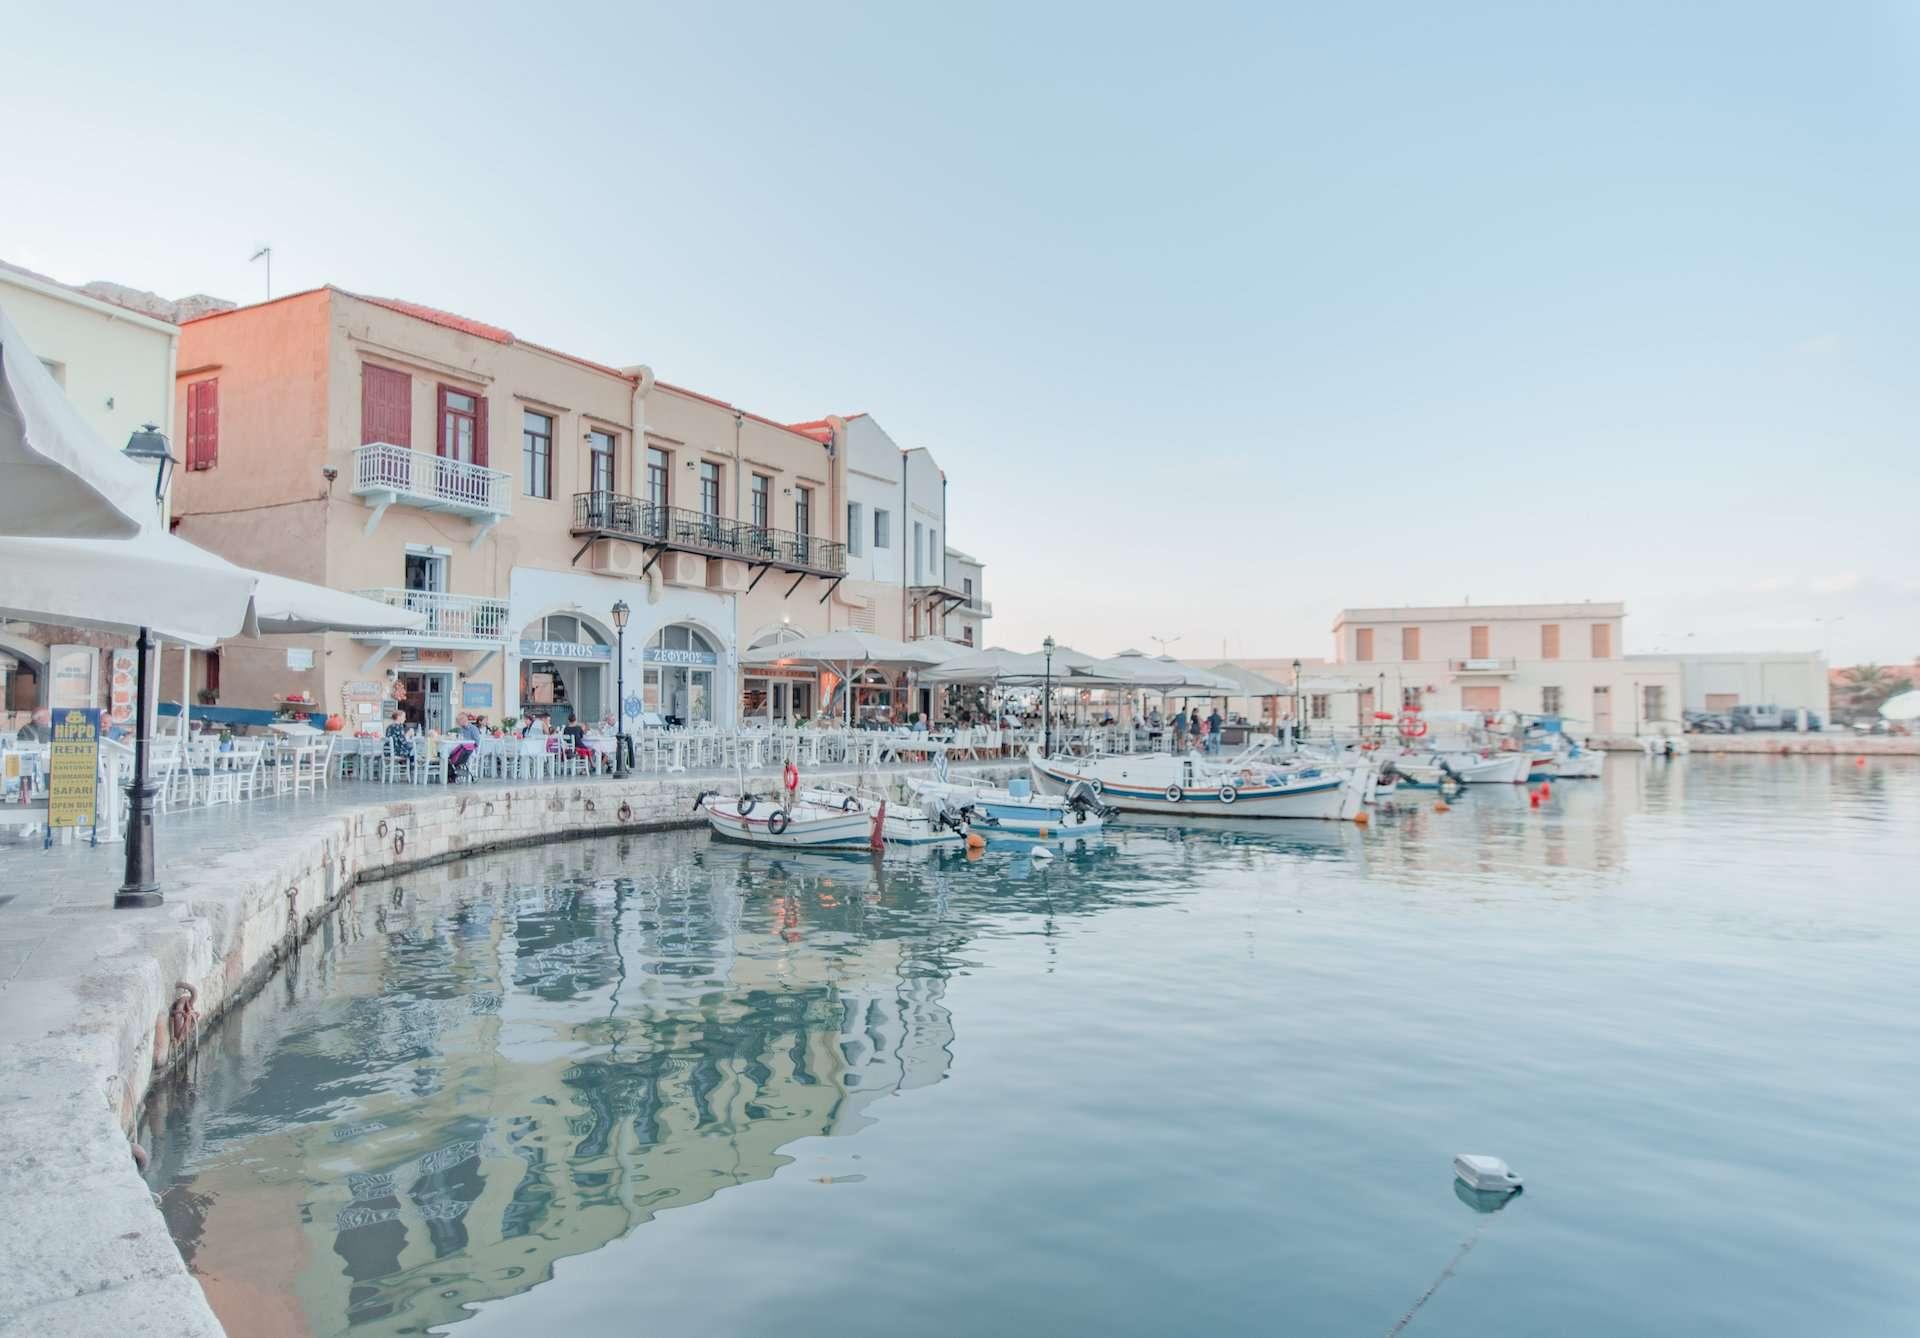 Venetian Harbor, Rethymno, Crete